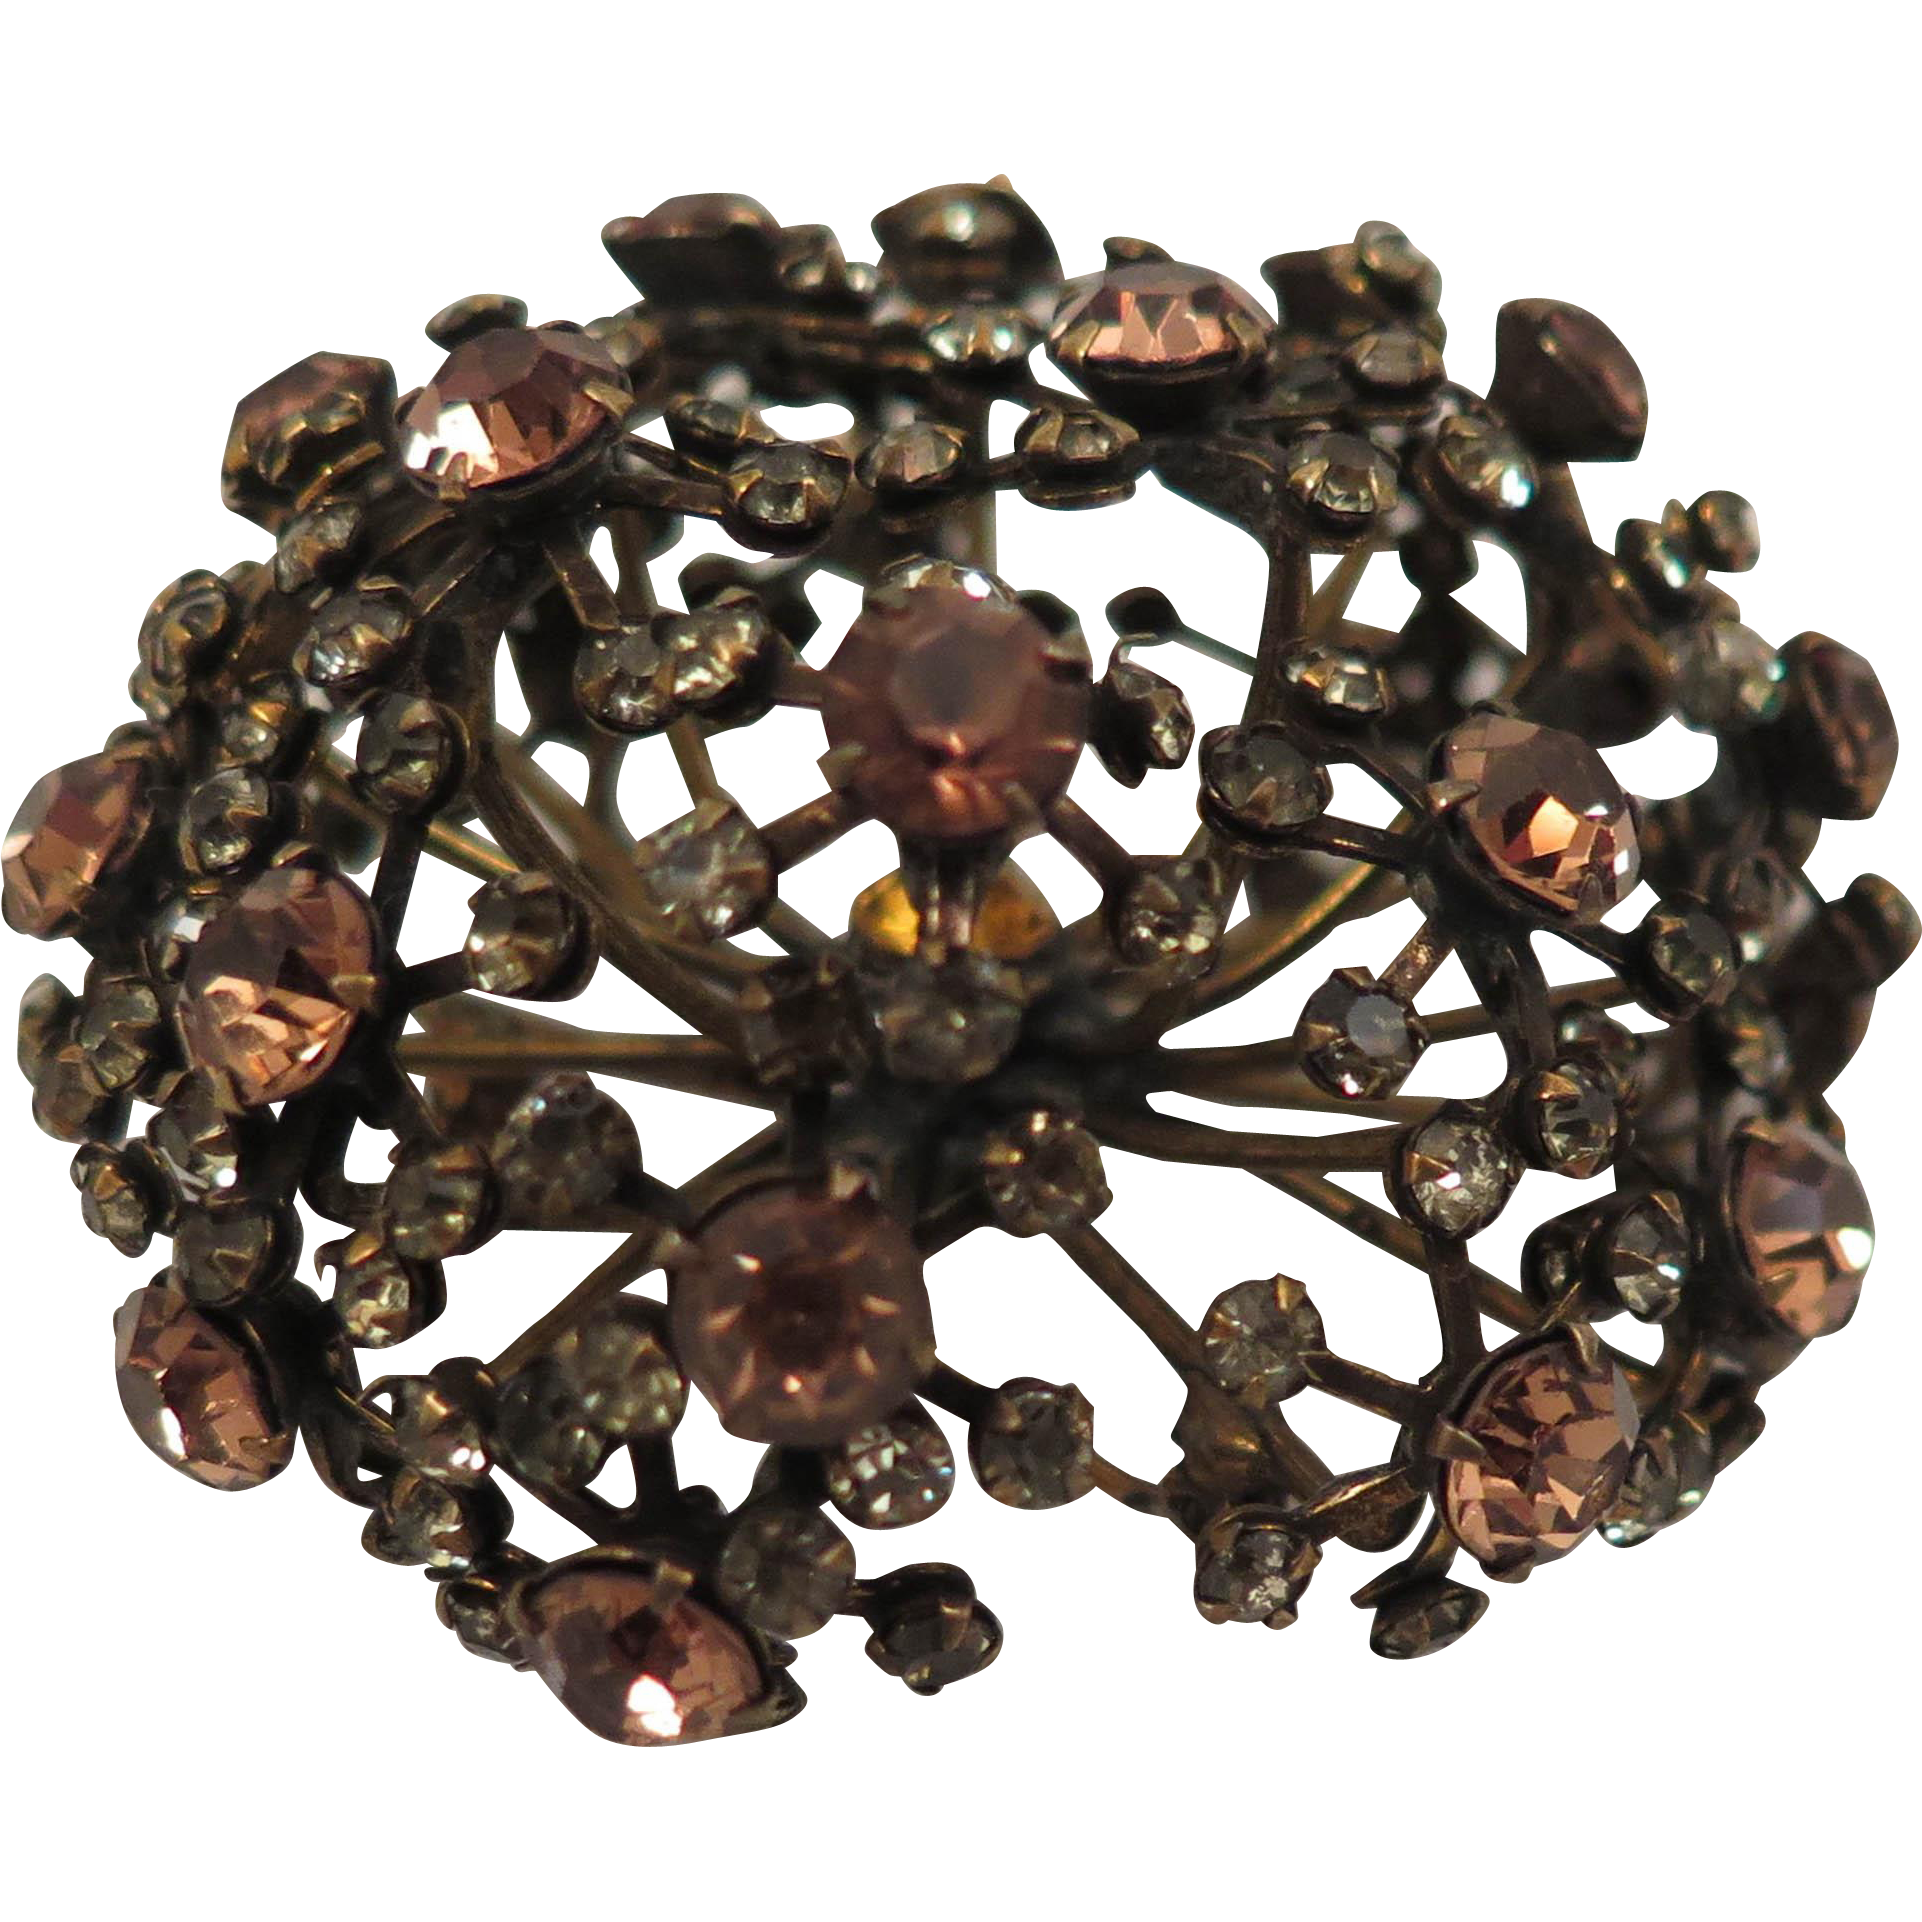 Vintage Warner Rhinestone Atomic Galaxy Brooch